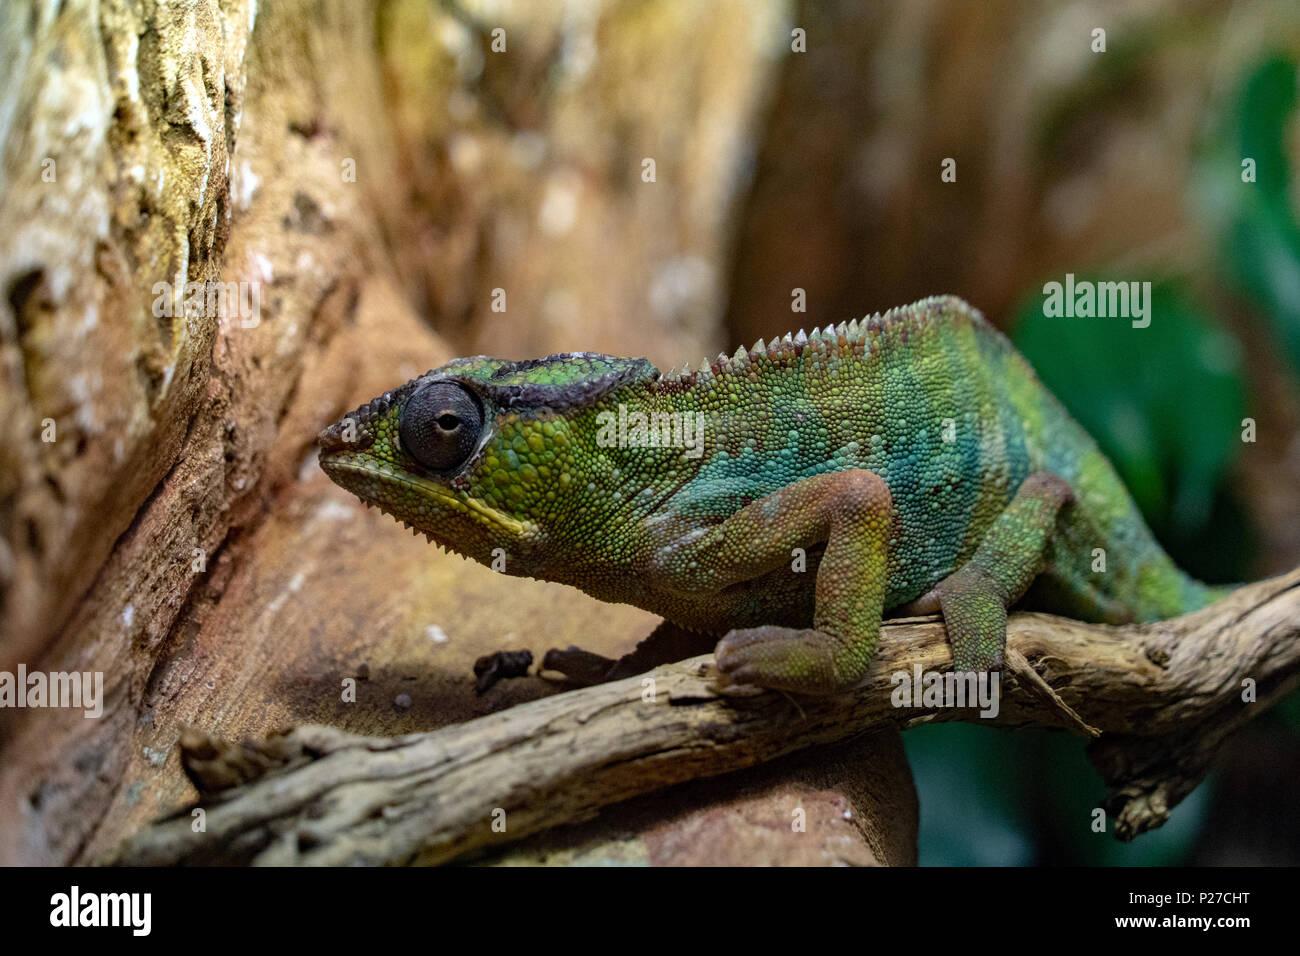 Panther Chamaleon camaleon Madagaskar Eidechse portrait Stockbild